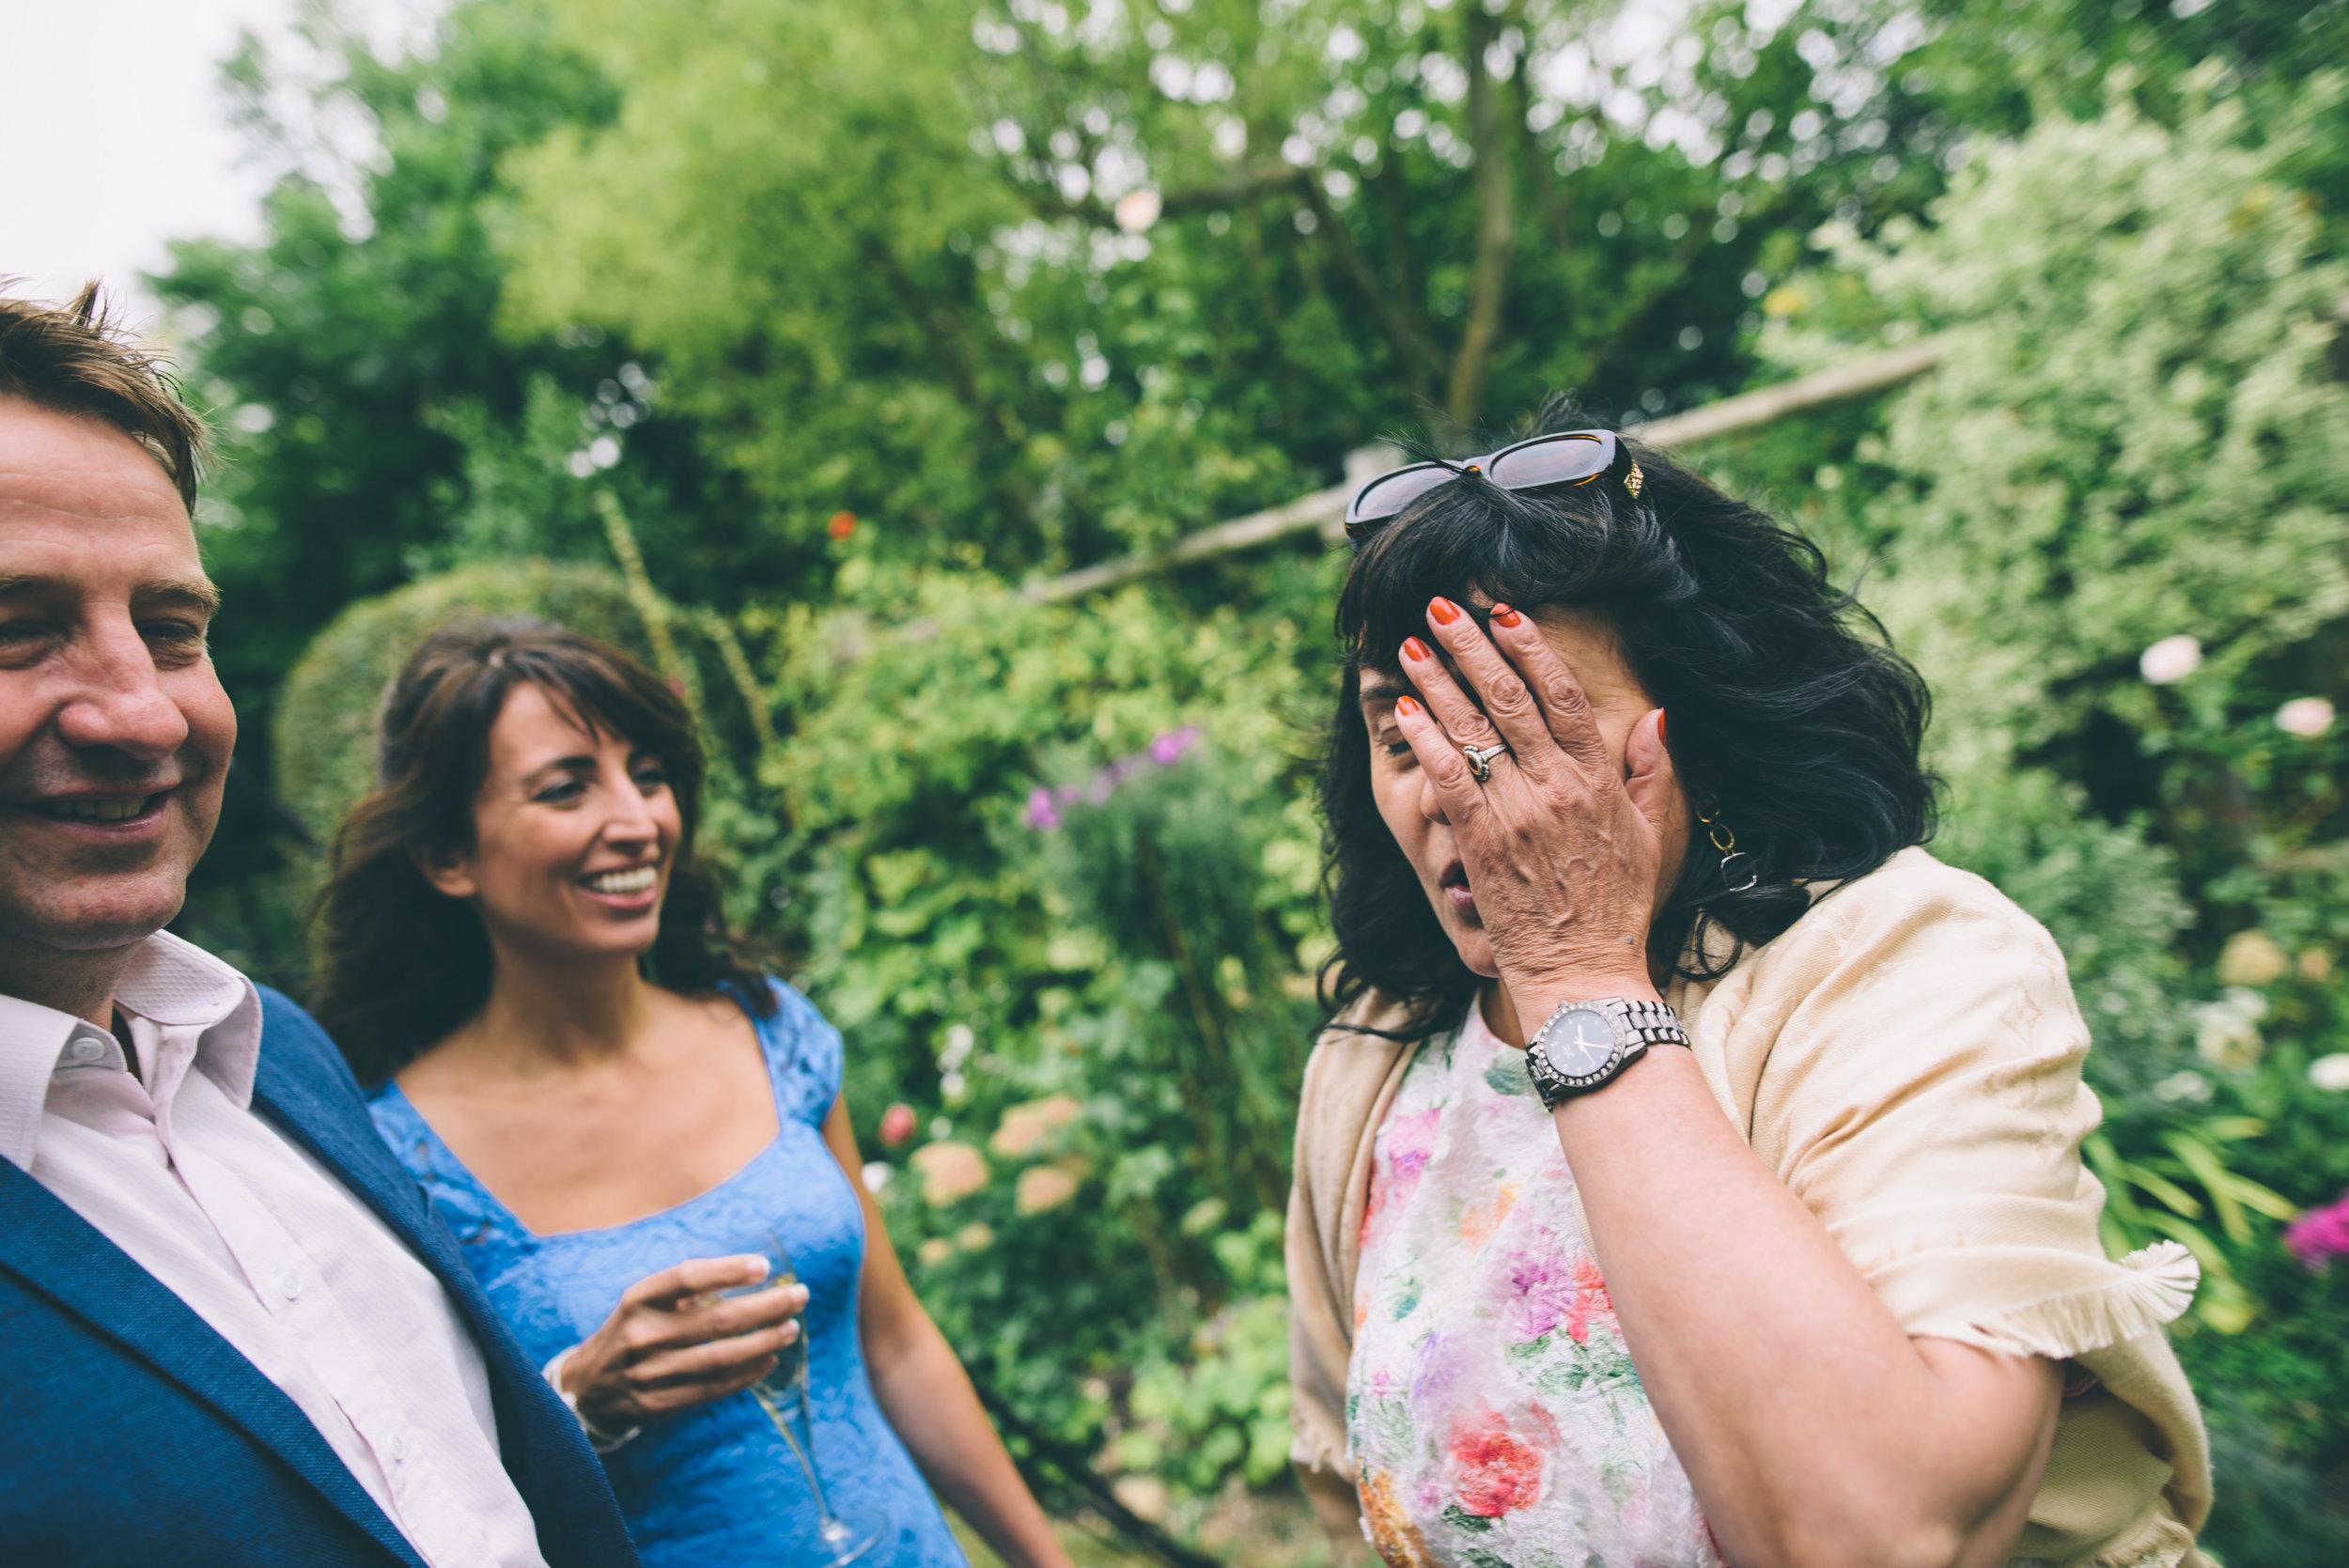 Garden Wedding photography Barley Herefordshire - Tracy + Matt -274.jpg